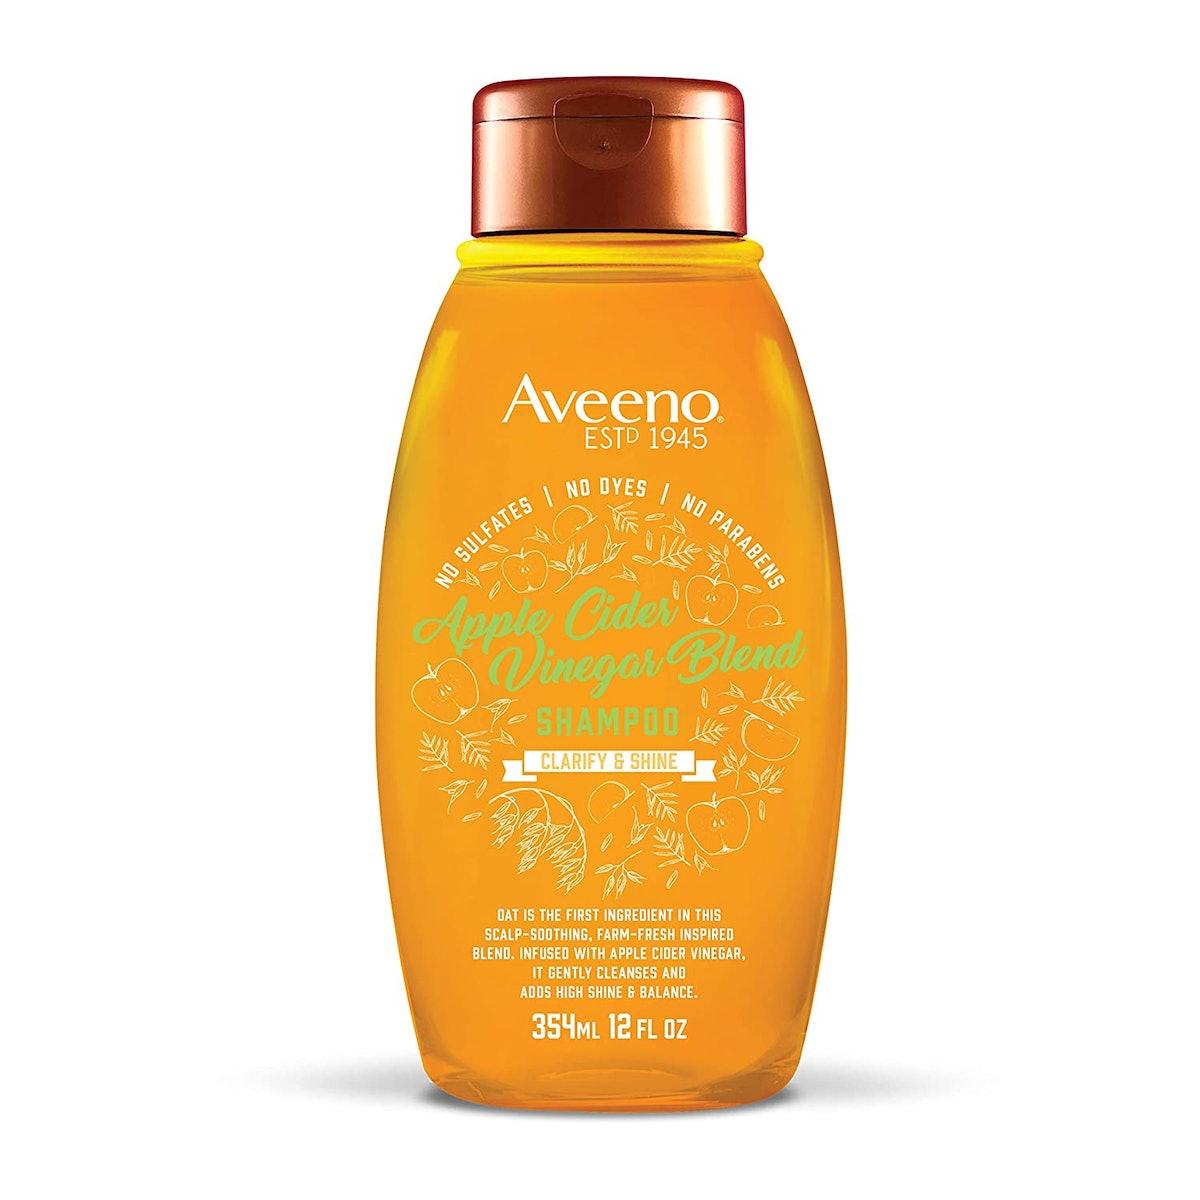 Aveeno Scalp Soothing Apple Cider Vinegar Blend Shampoo